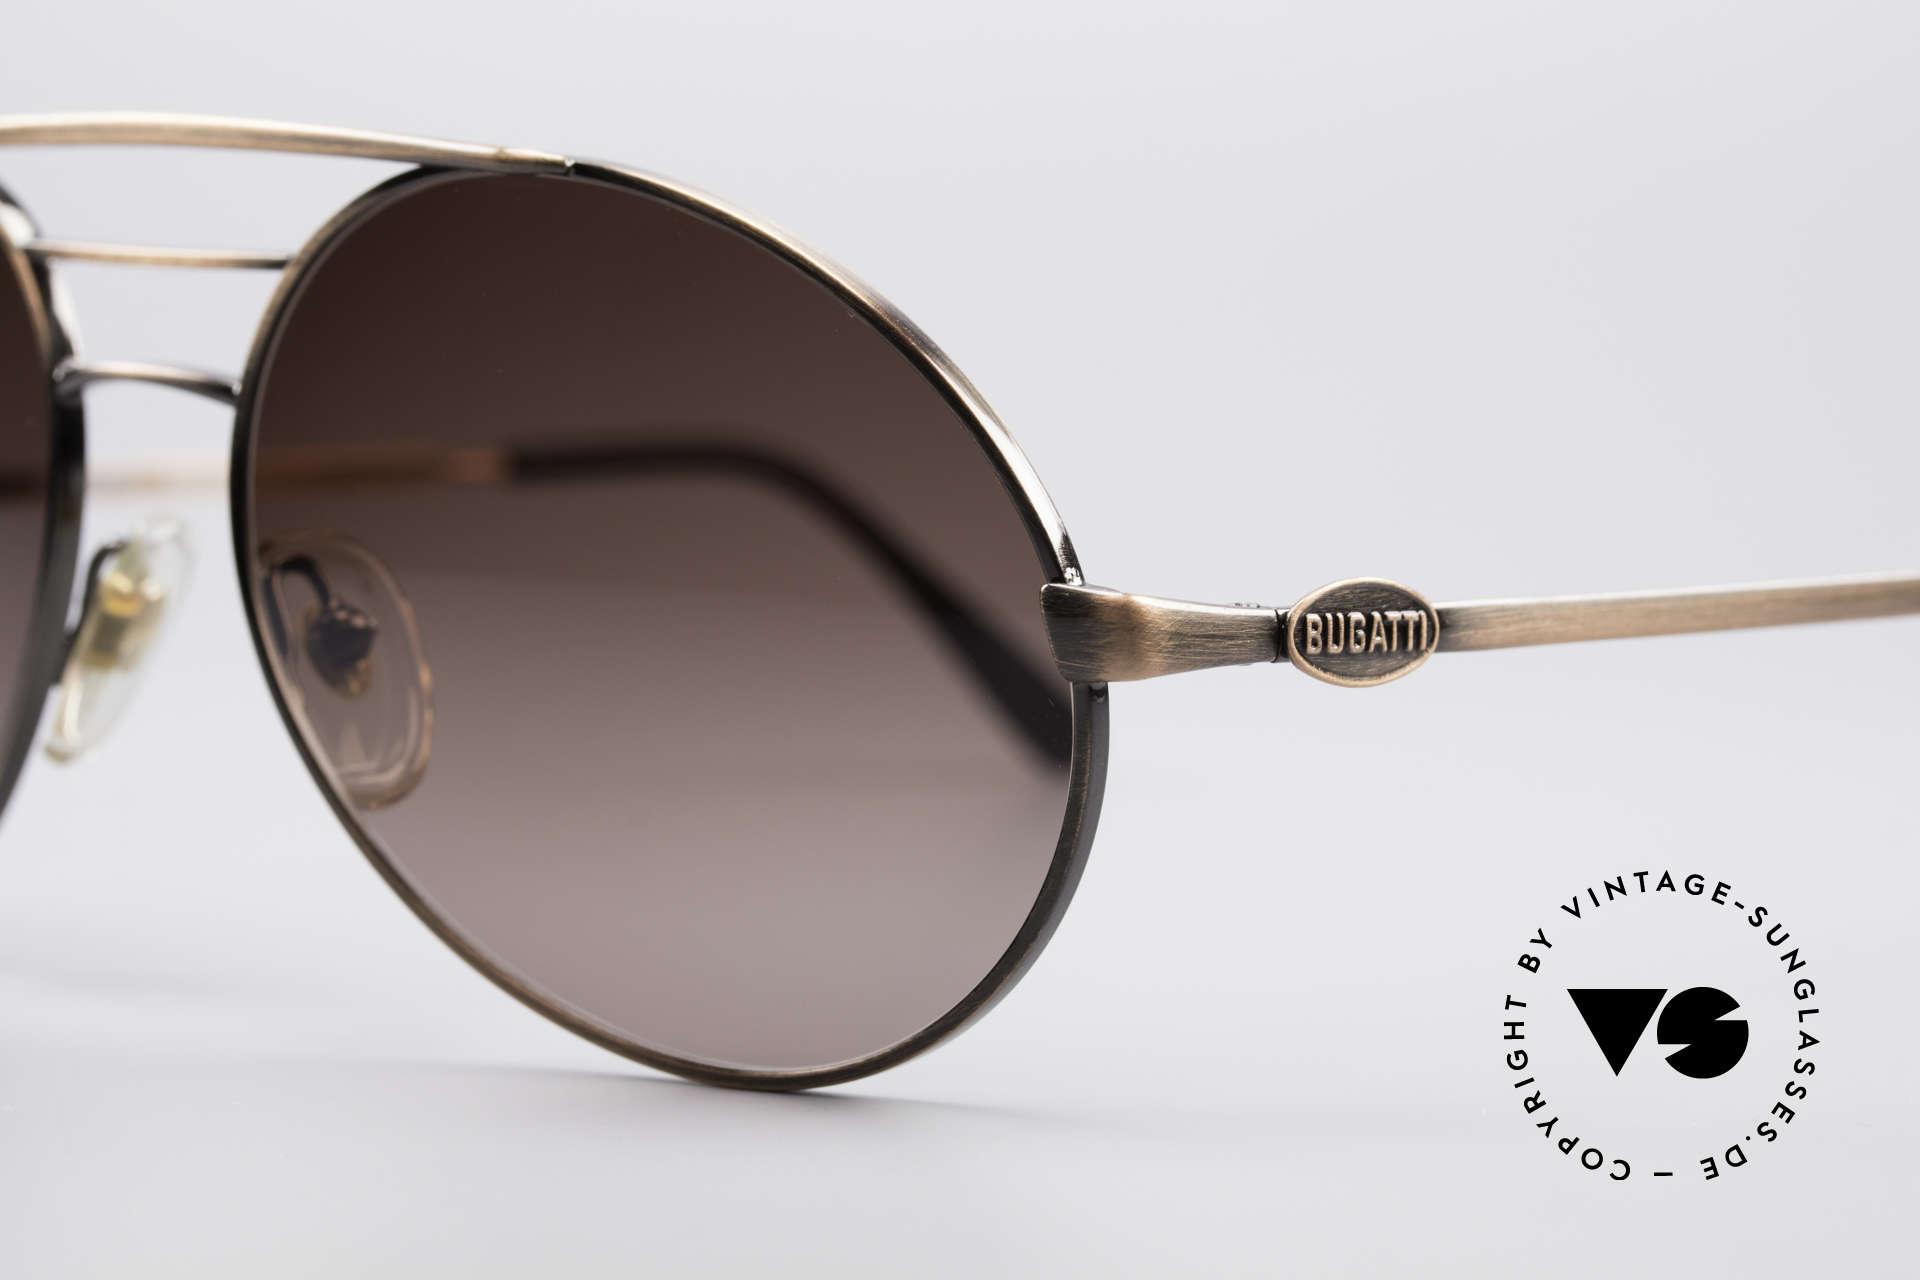 Bugatti 65090 Men's 80's Designer Shades, materials (100% UV prot.) & workmanship on top level, Made for Men